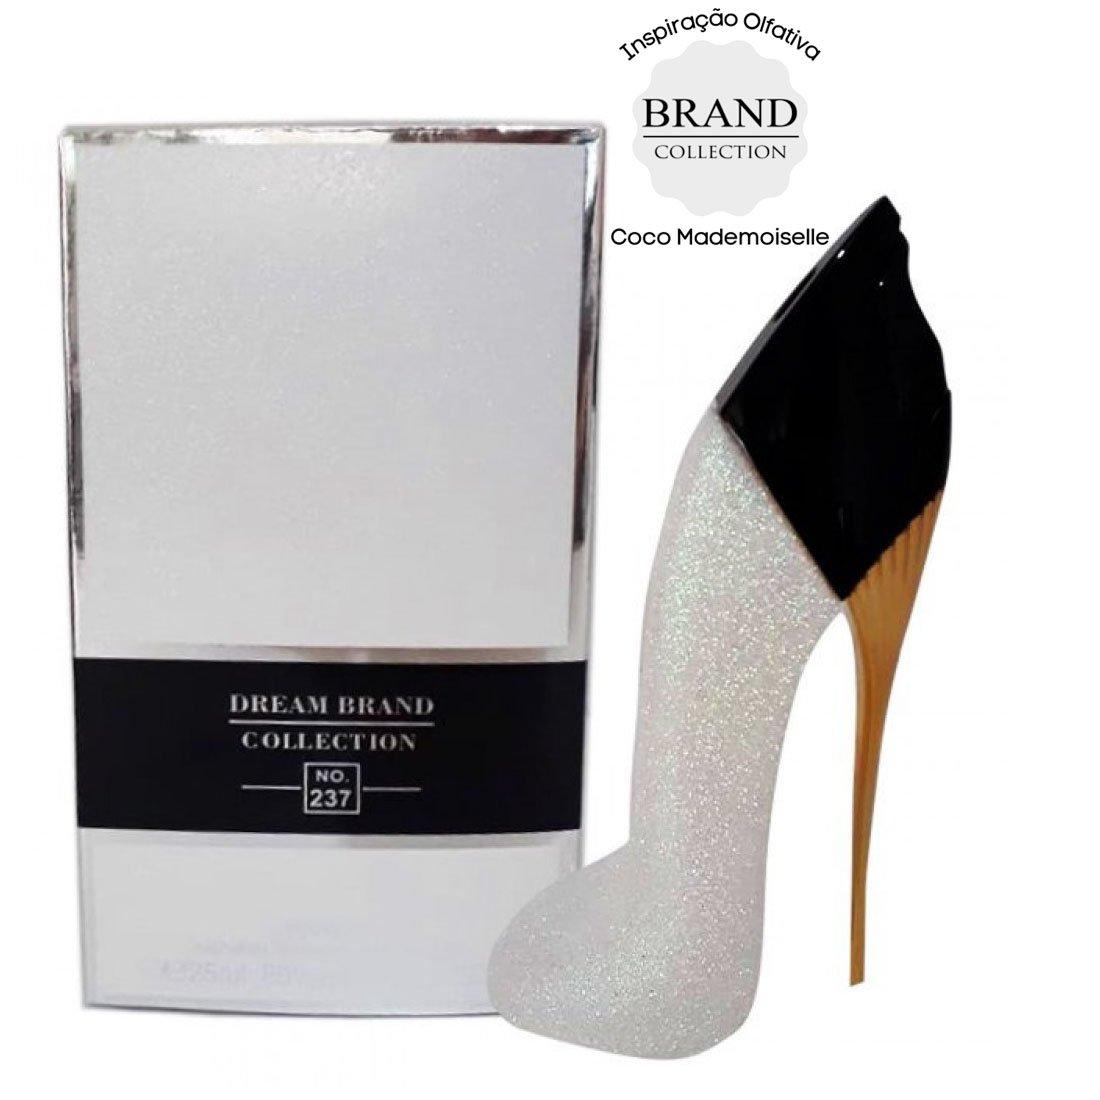 perfume brand collection 237 feminino 25 ml sapatinho glitter branco 51223 2000 203793 1